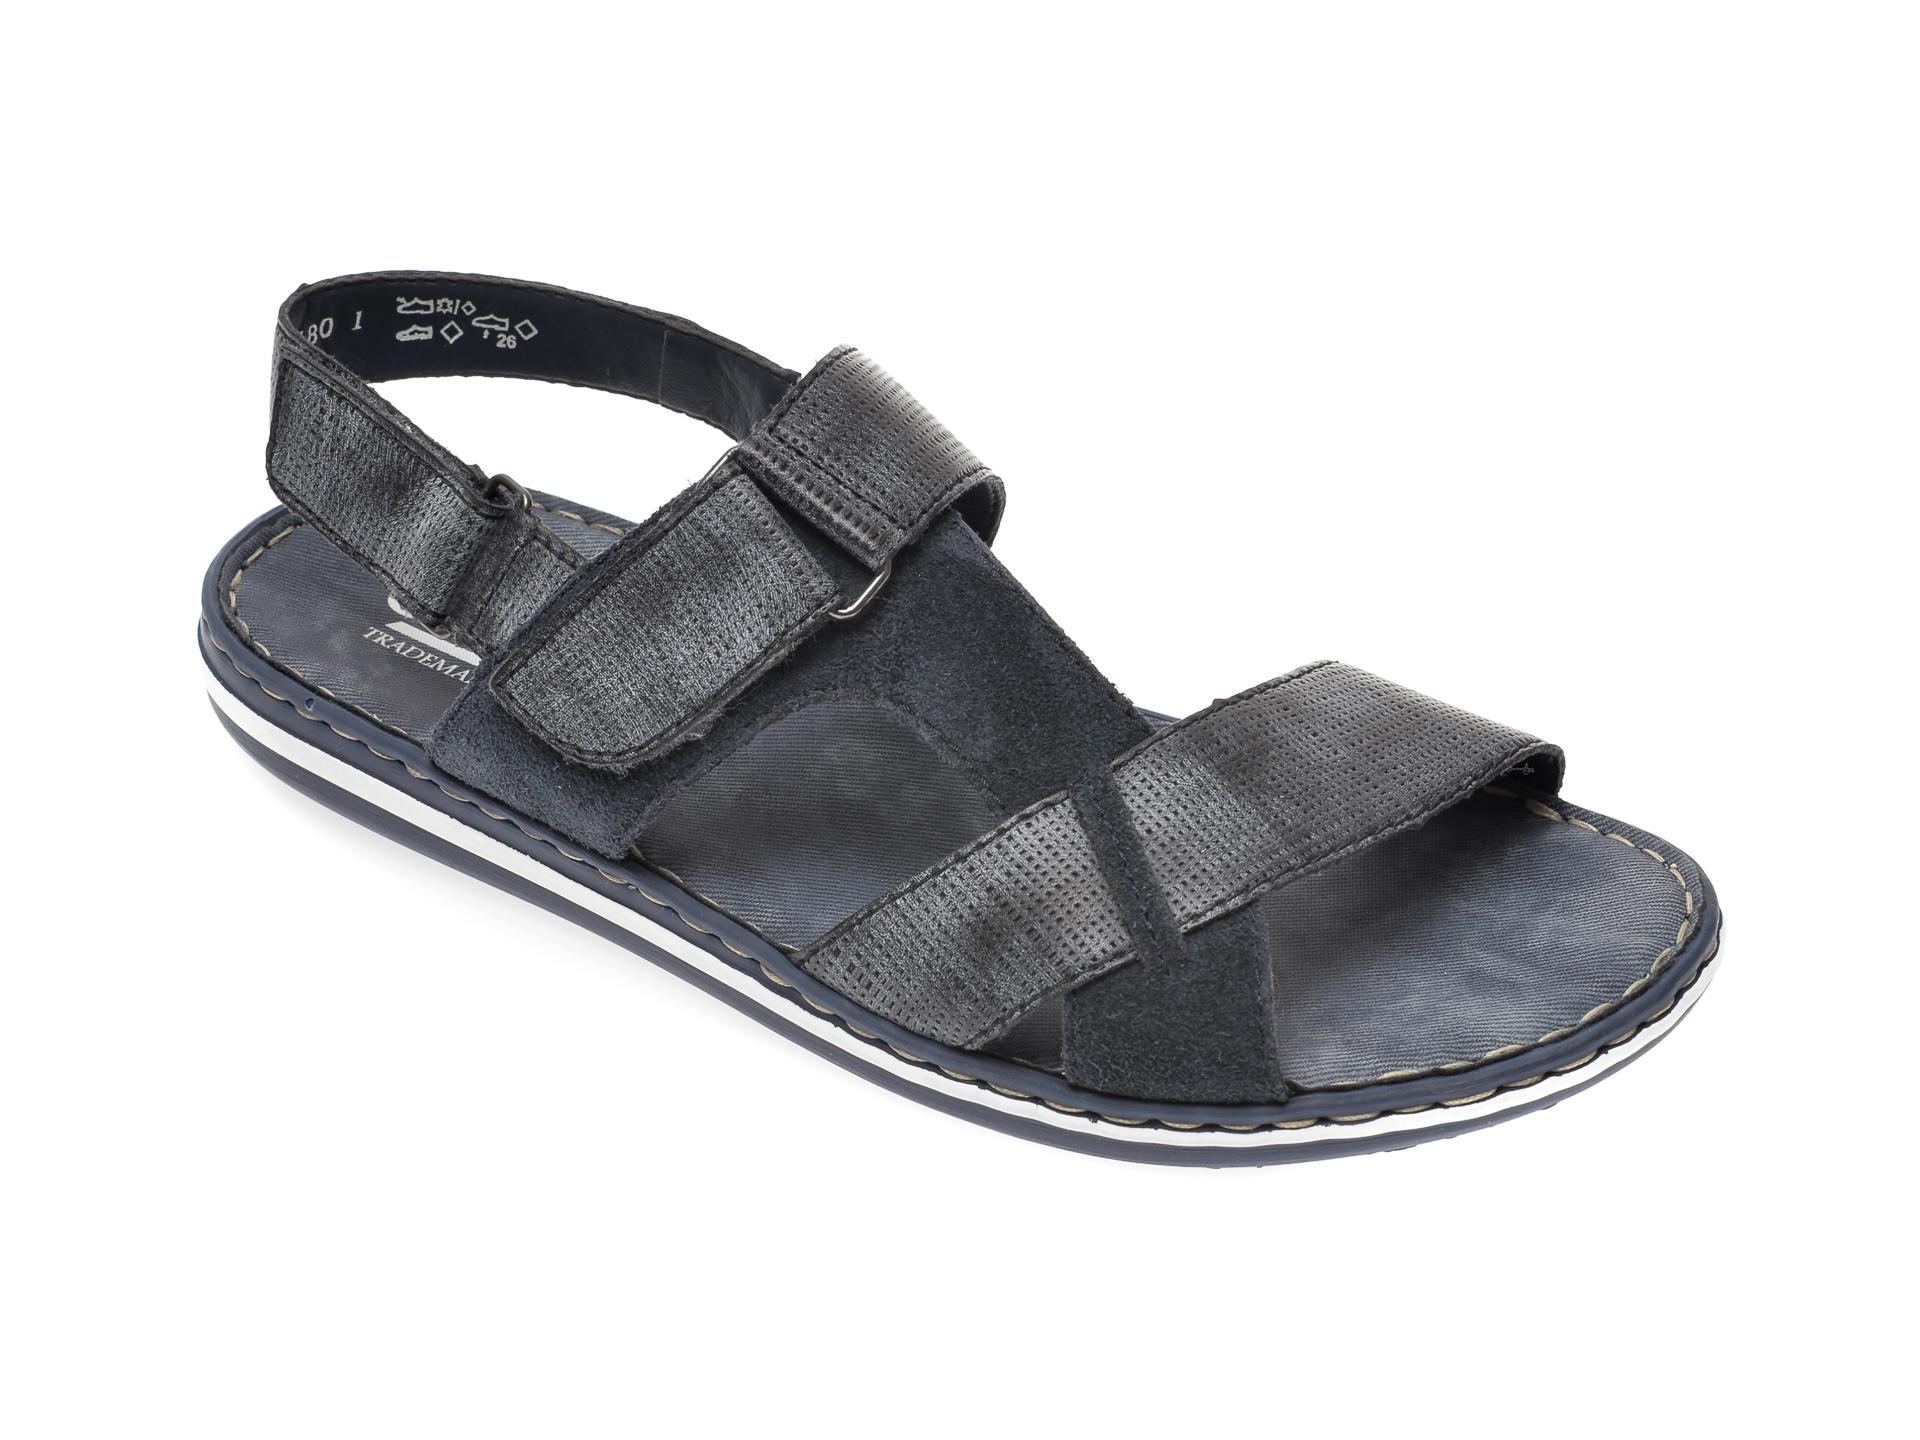 Sandale RIEKER bleumarin, 21070, din piele naturala imagine